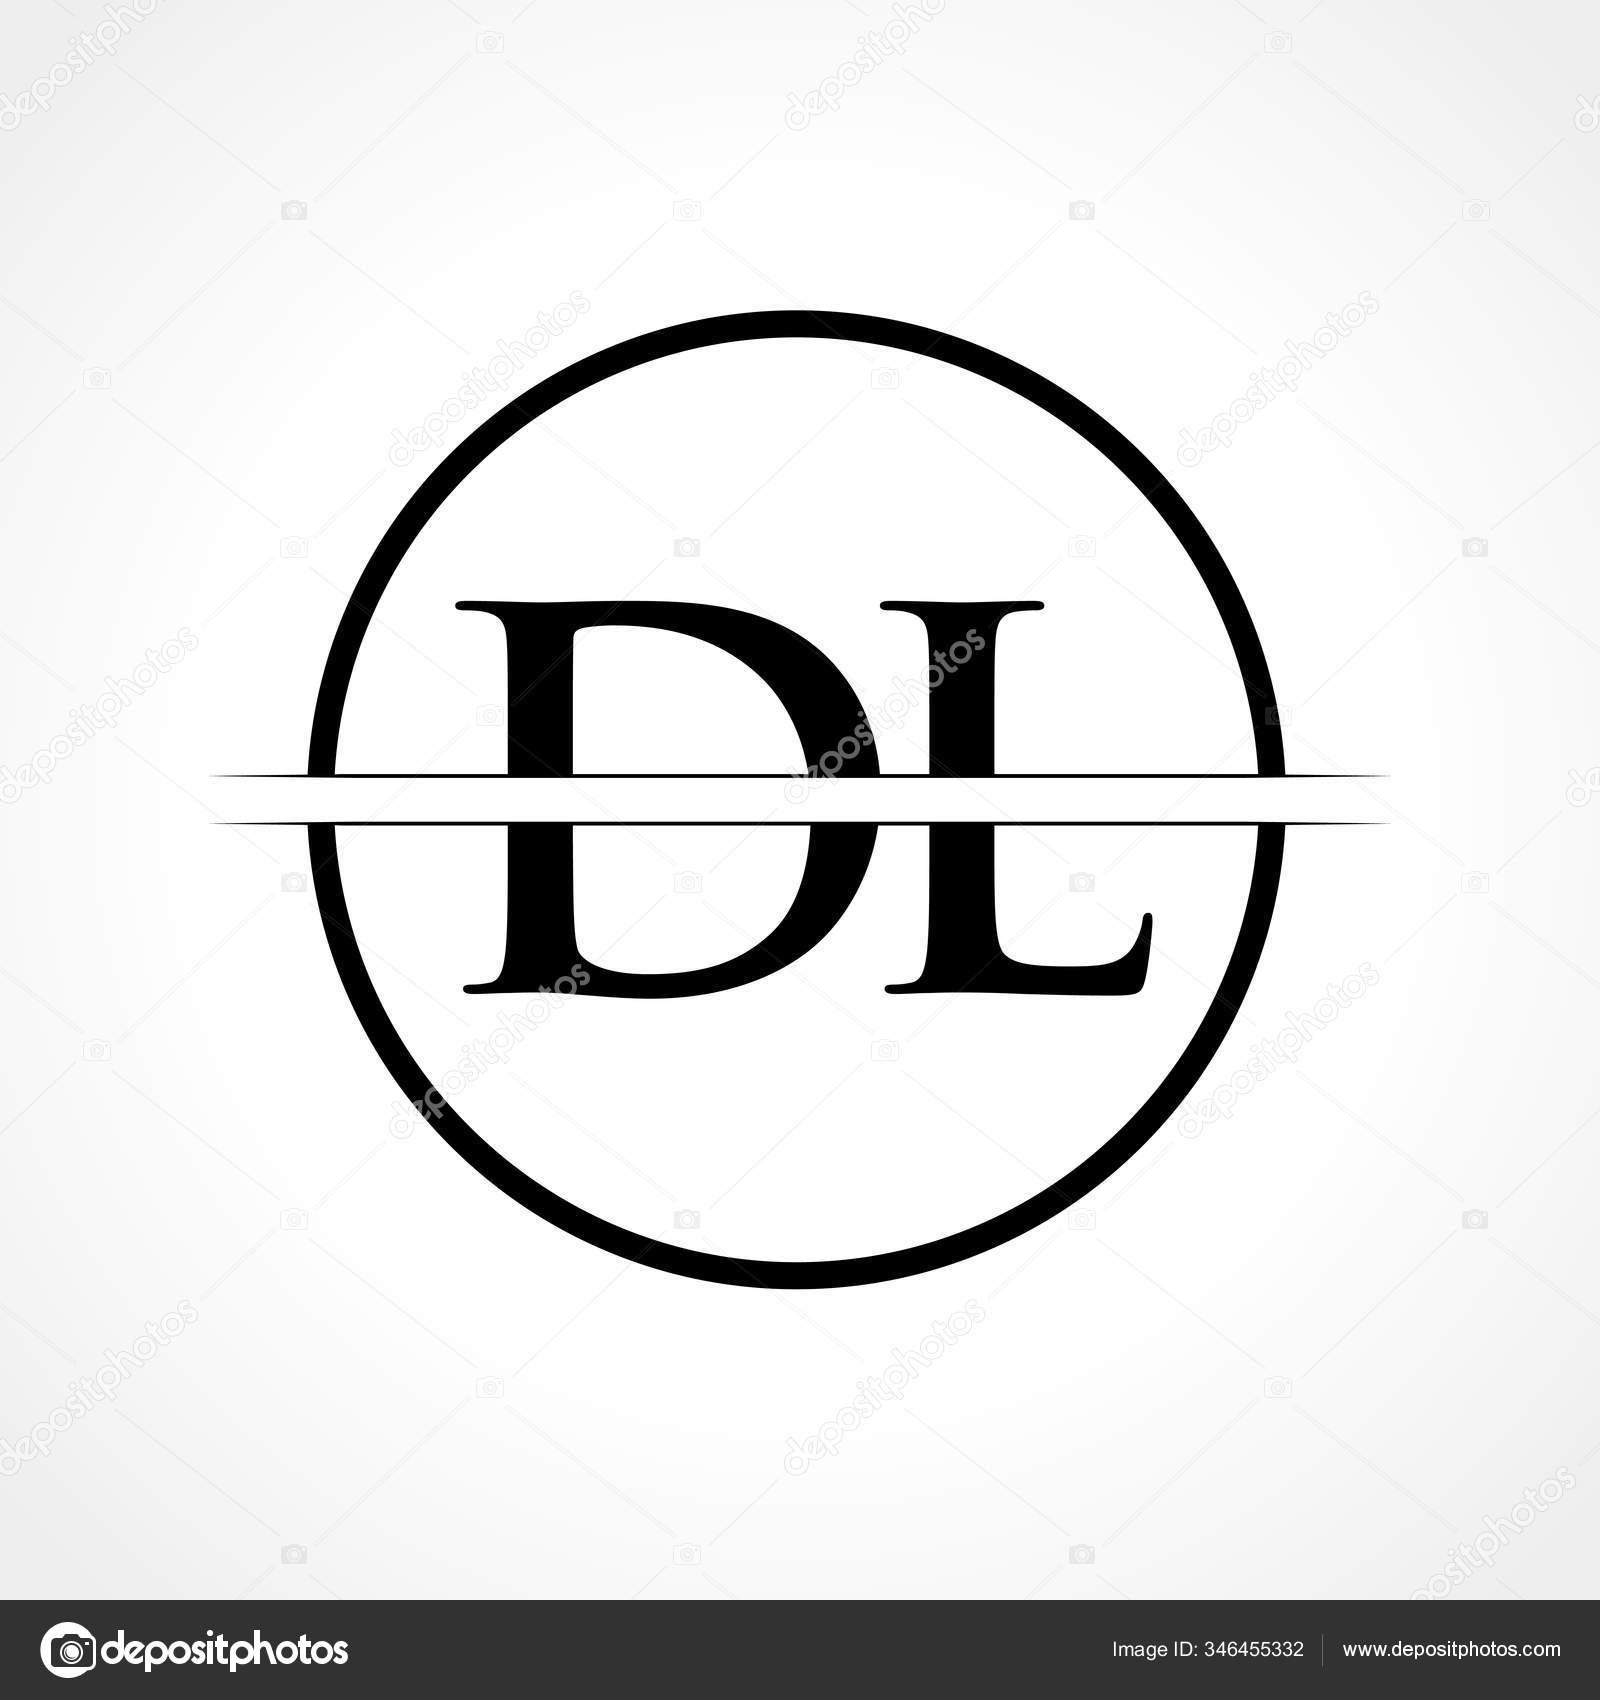 Áˆ D L Logos Stock Images Royalty Free Dl Logo Vectors Download On Depositphotos